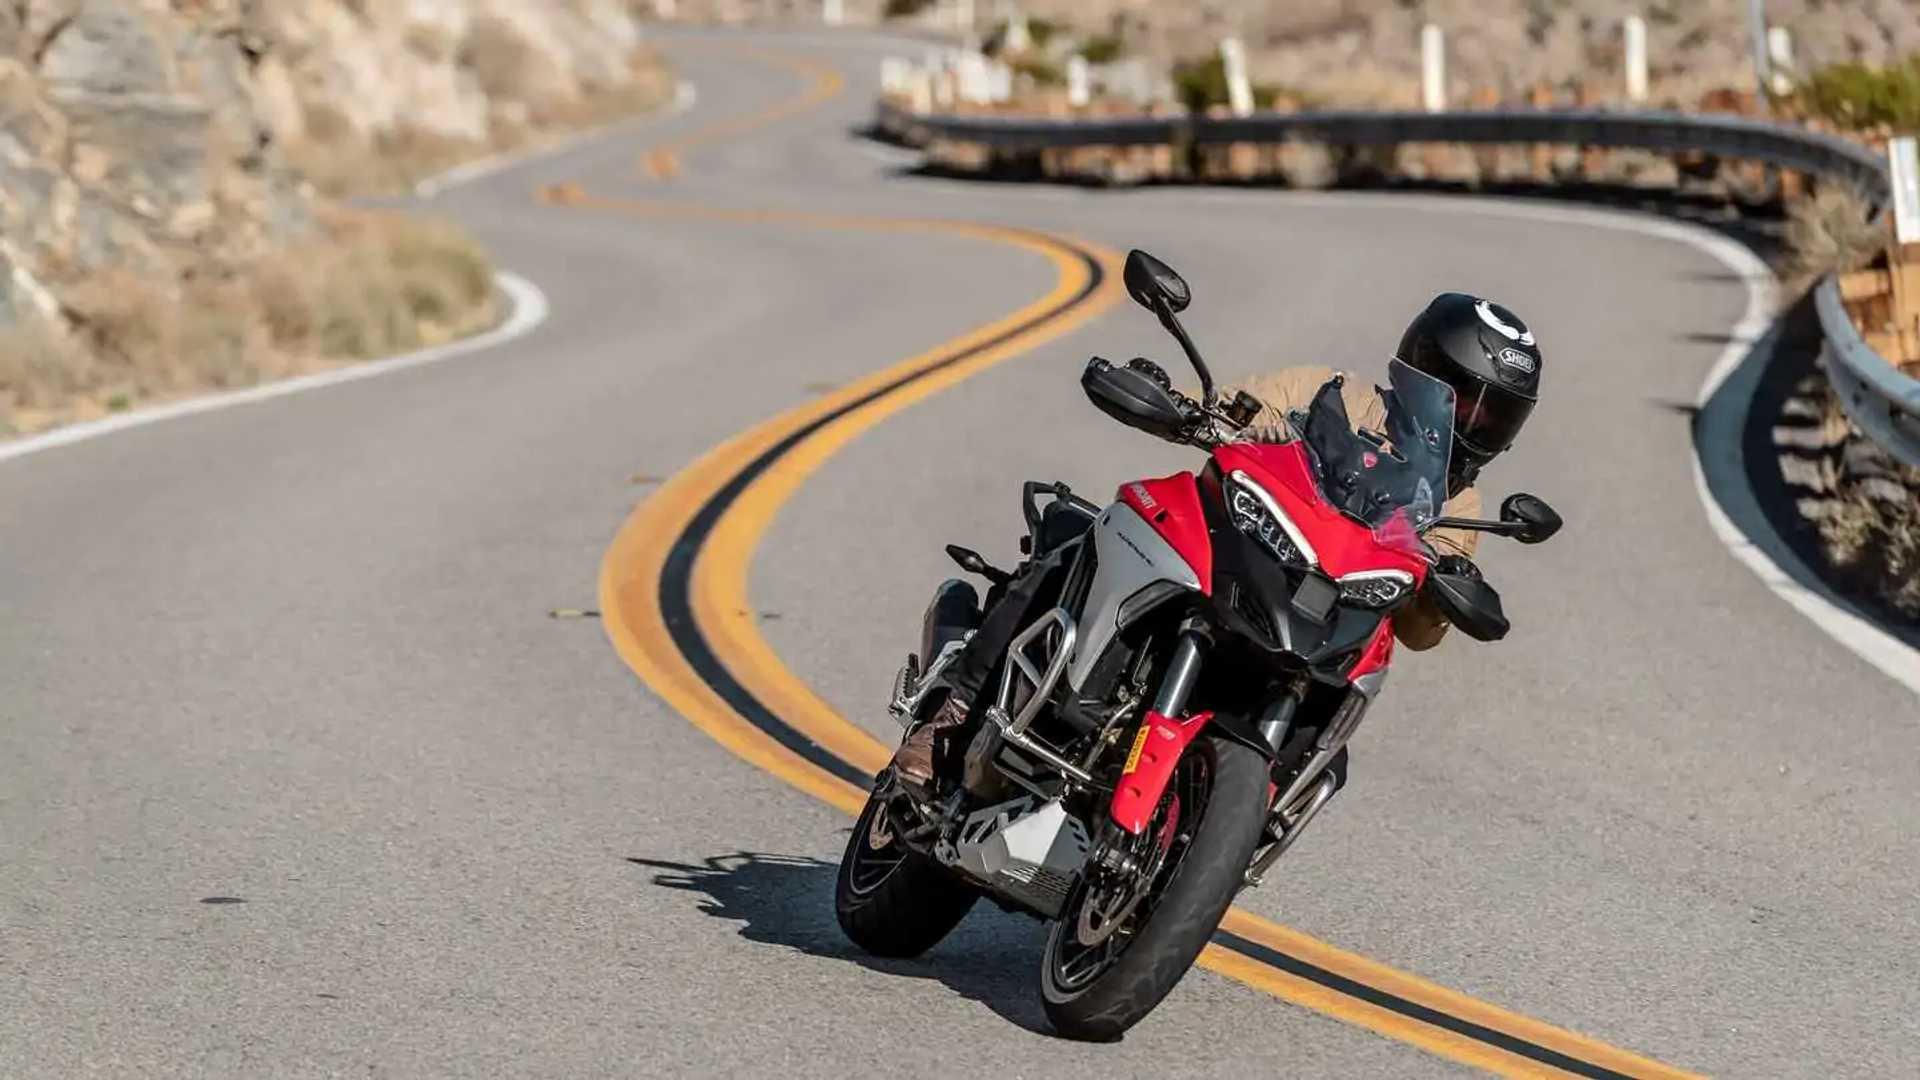 2021 Ducati Multistrada V4 S - Twisties